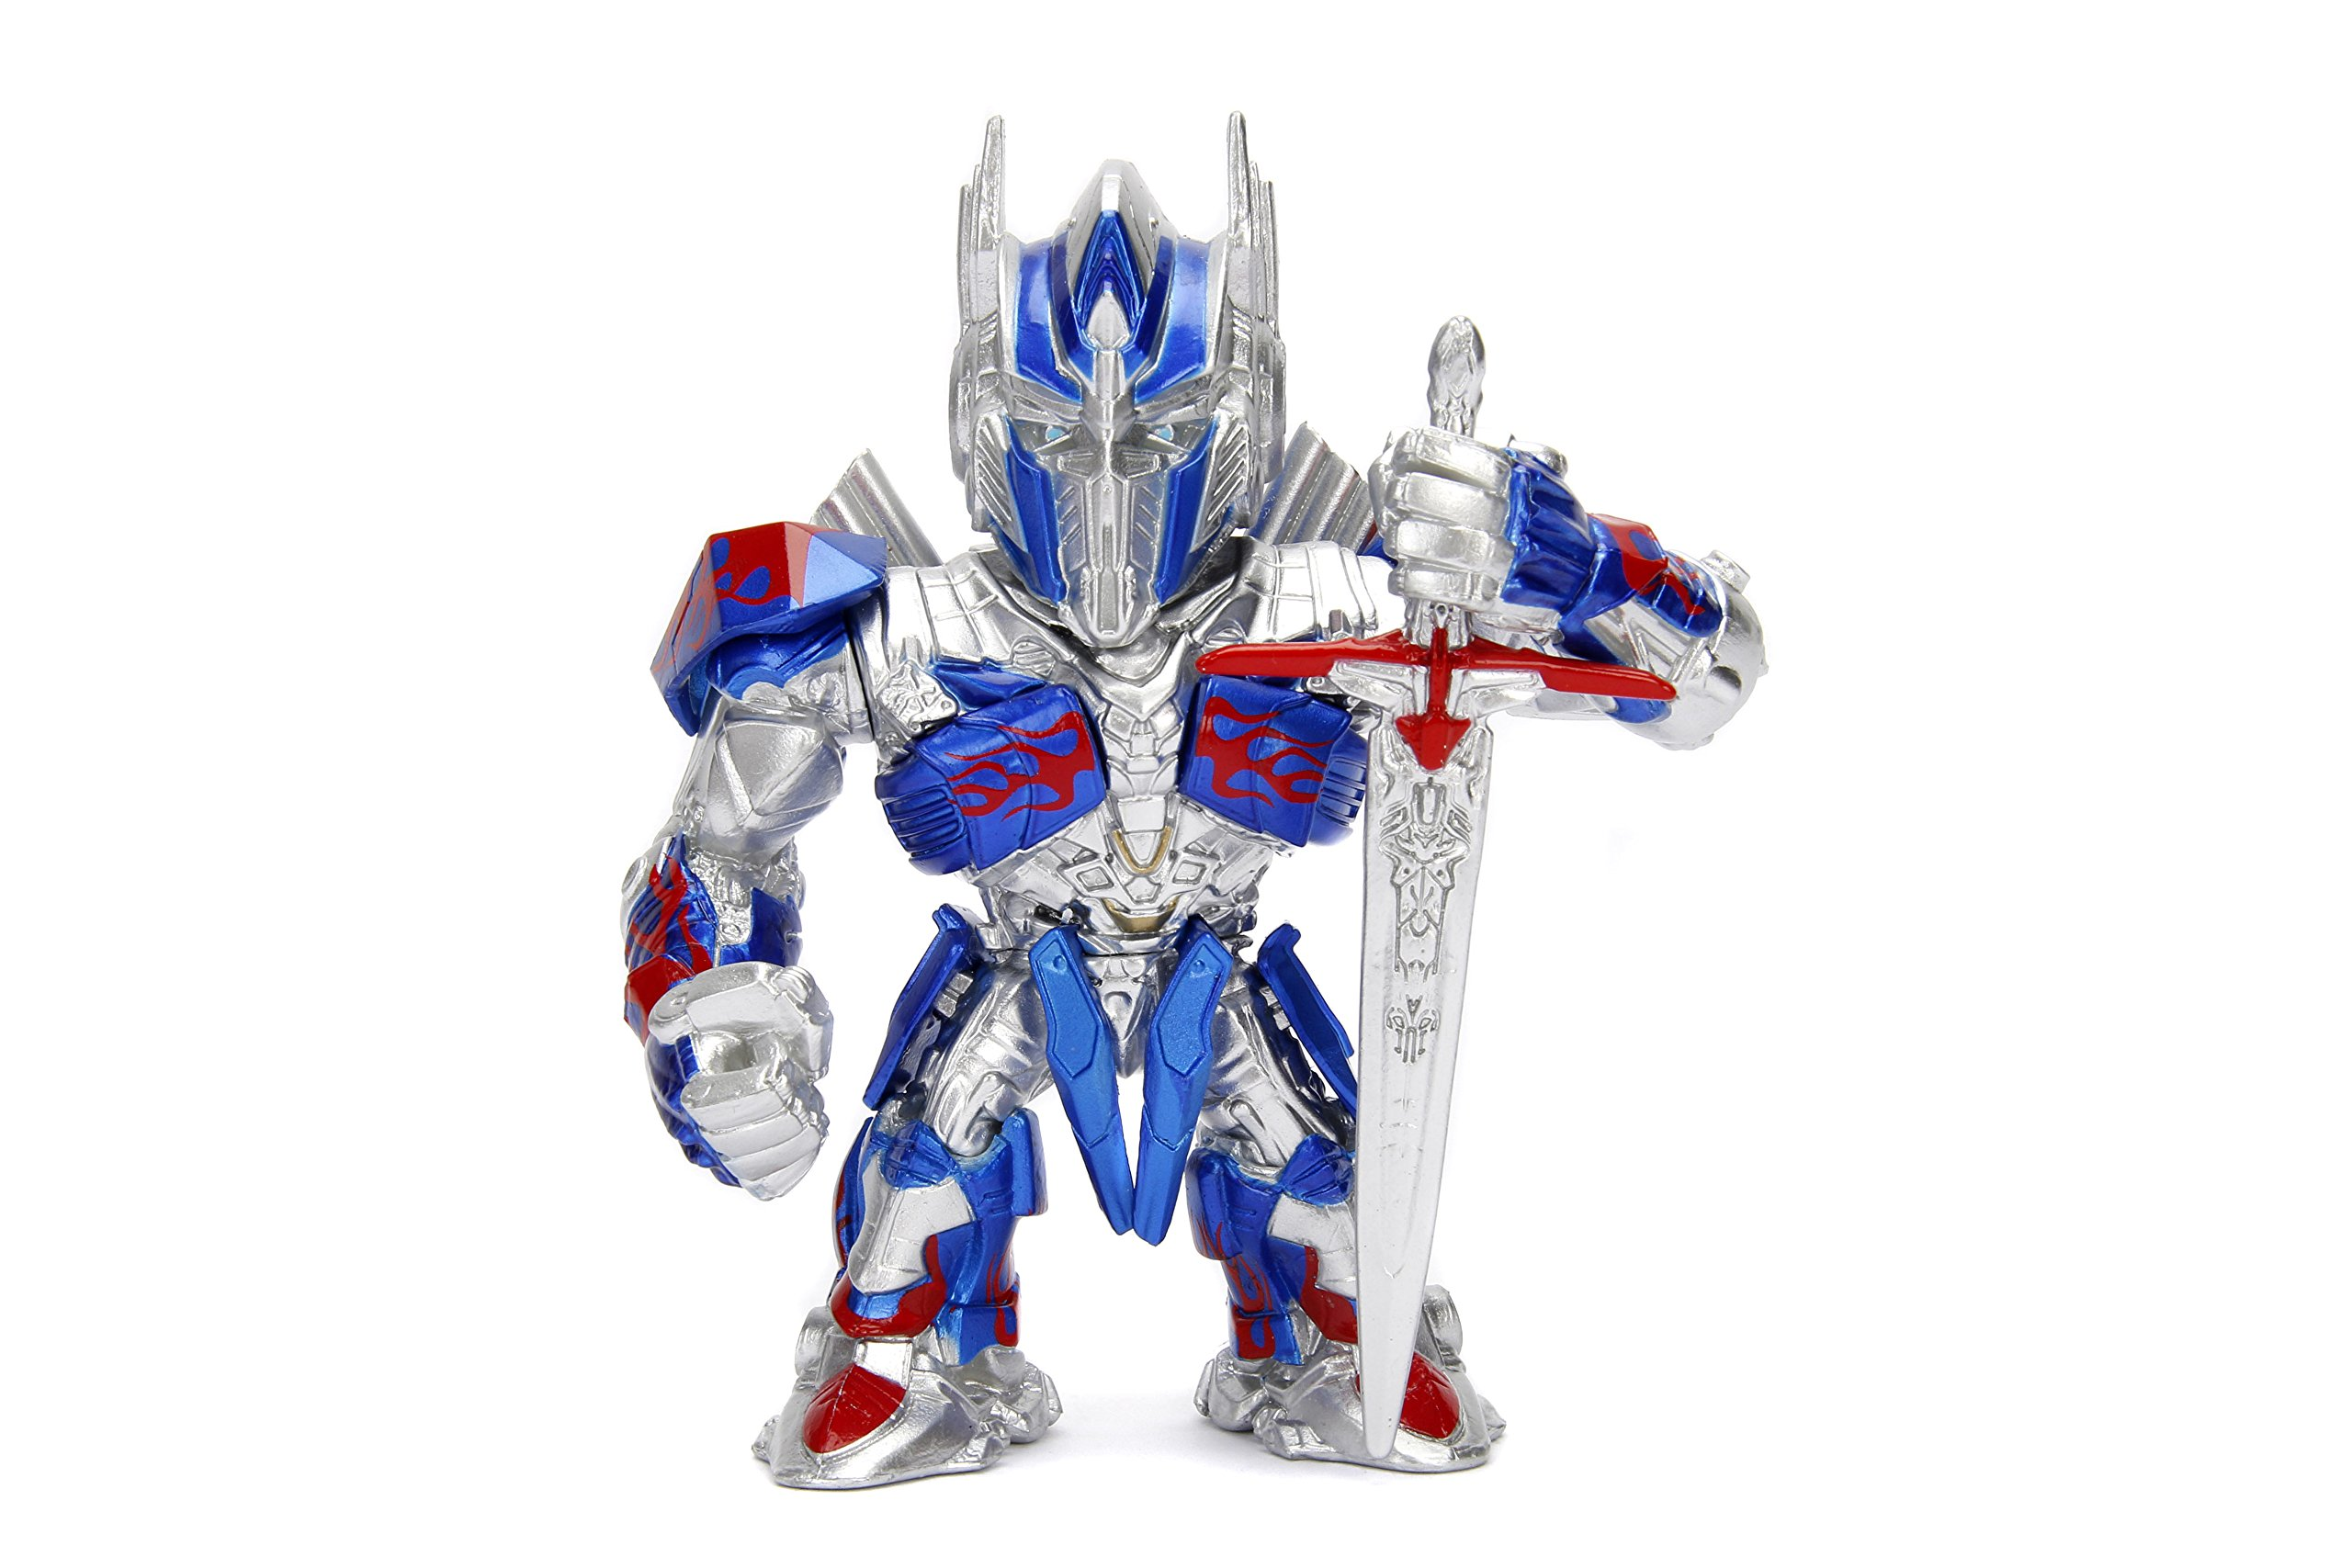 "Jada Toys Metalfigs Transformers- The Last Knight Optimus Prime (M407) Metals Die-Cast Collectible Toy Figure, 4"", Multicolor"